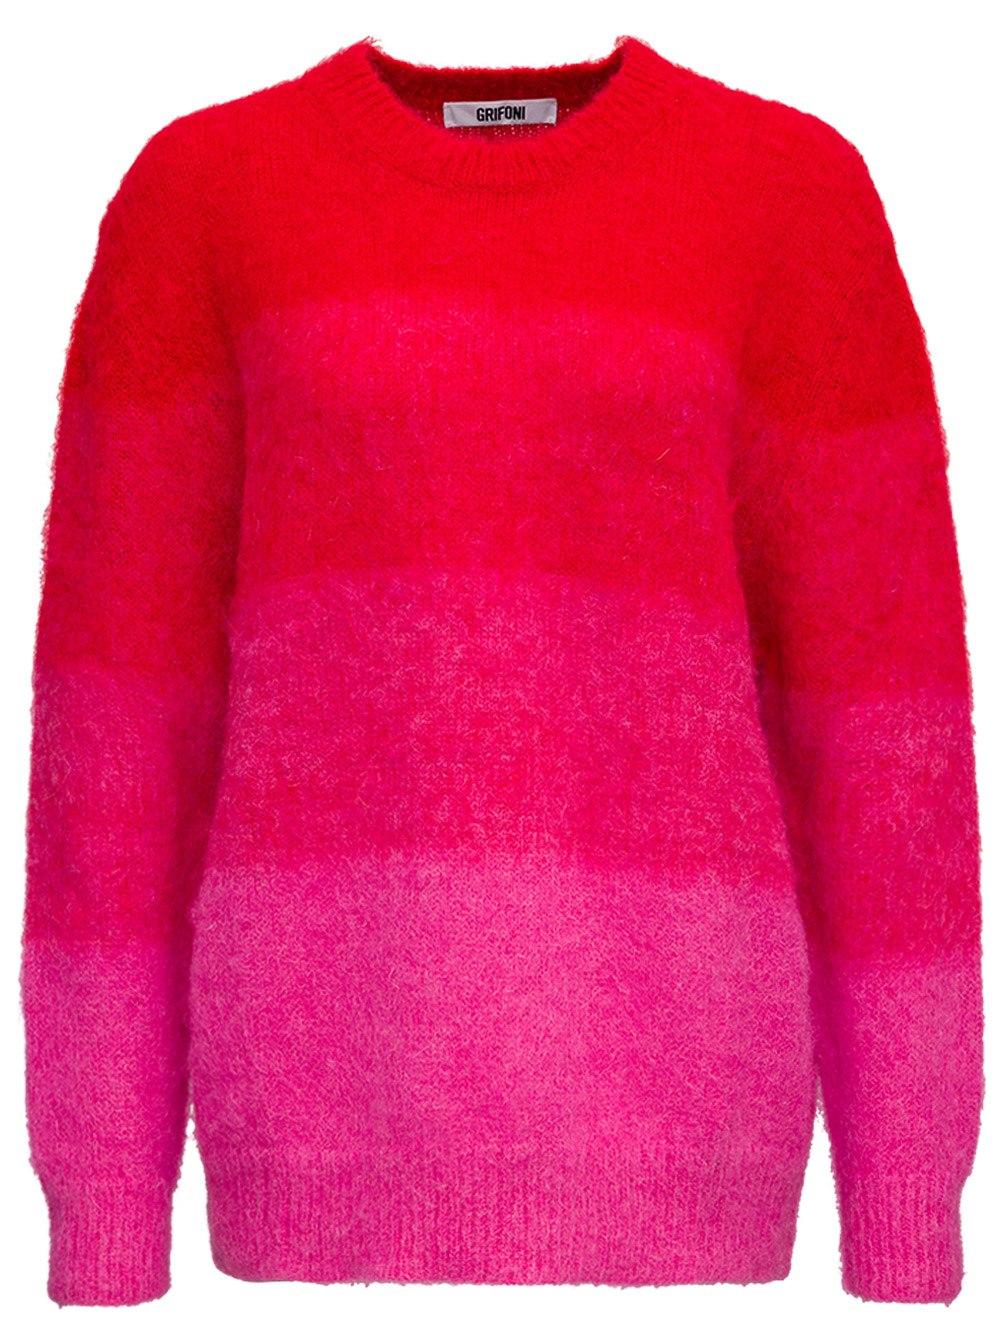 Degradé Bicolor Mohair Sweater